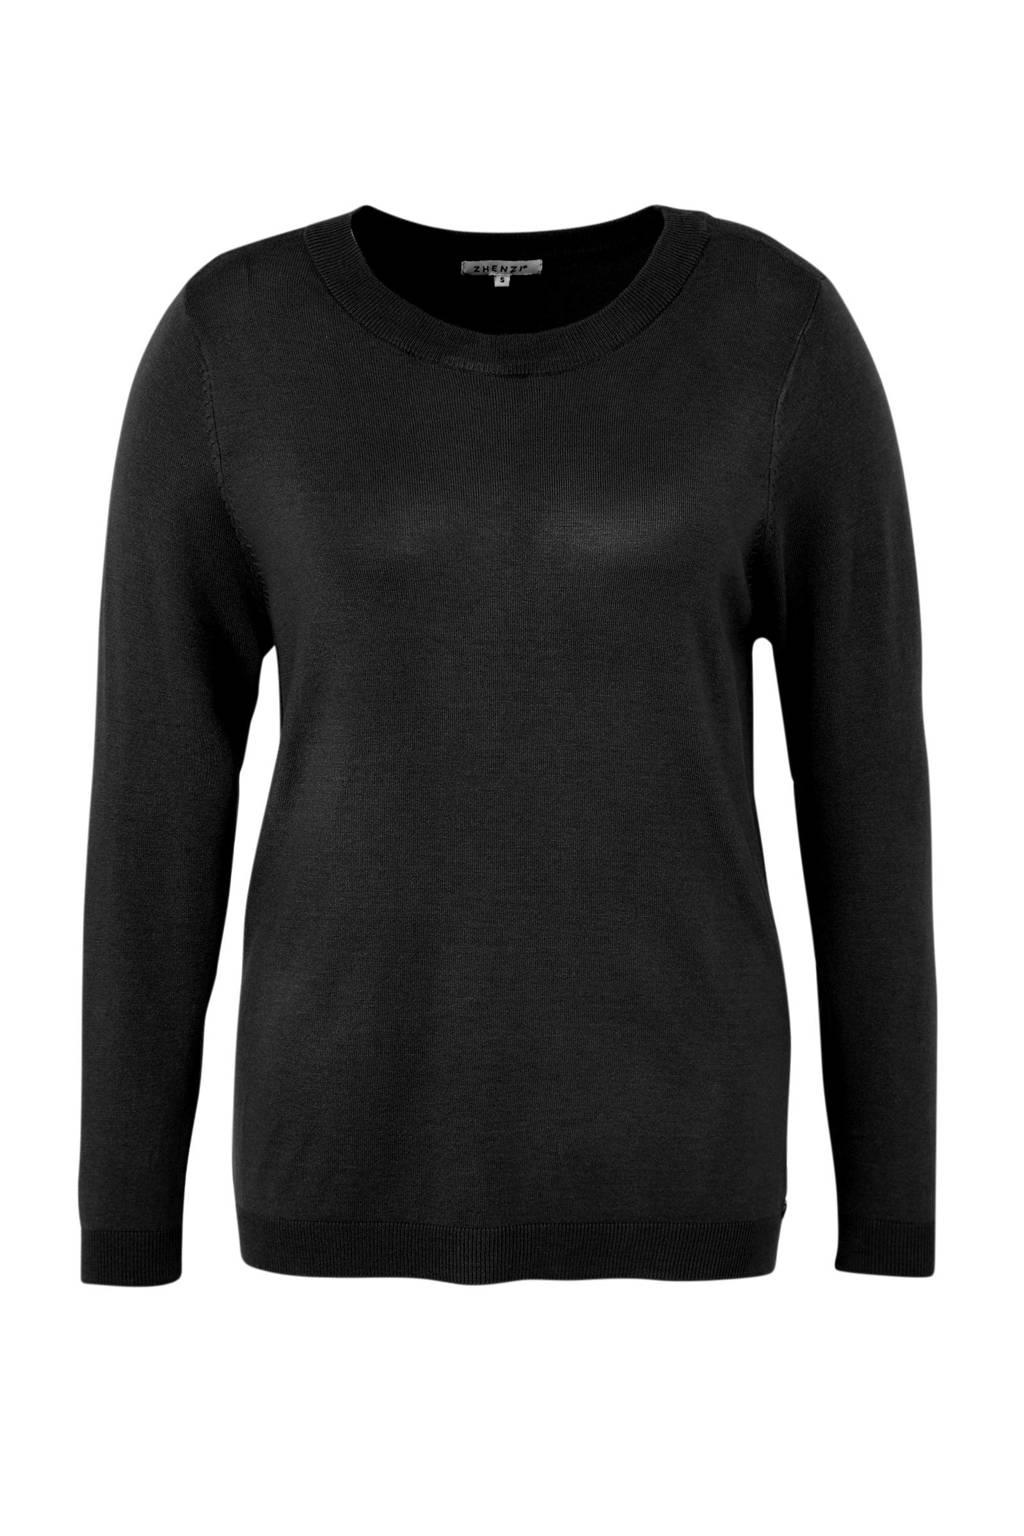 Zhenzi fijngebreide trui zwart, Zwart